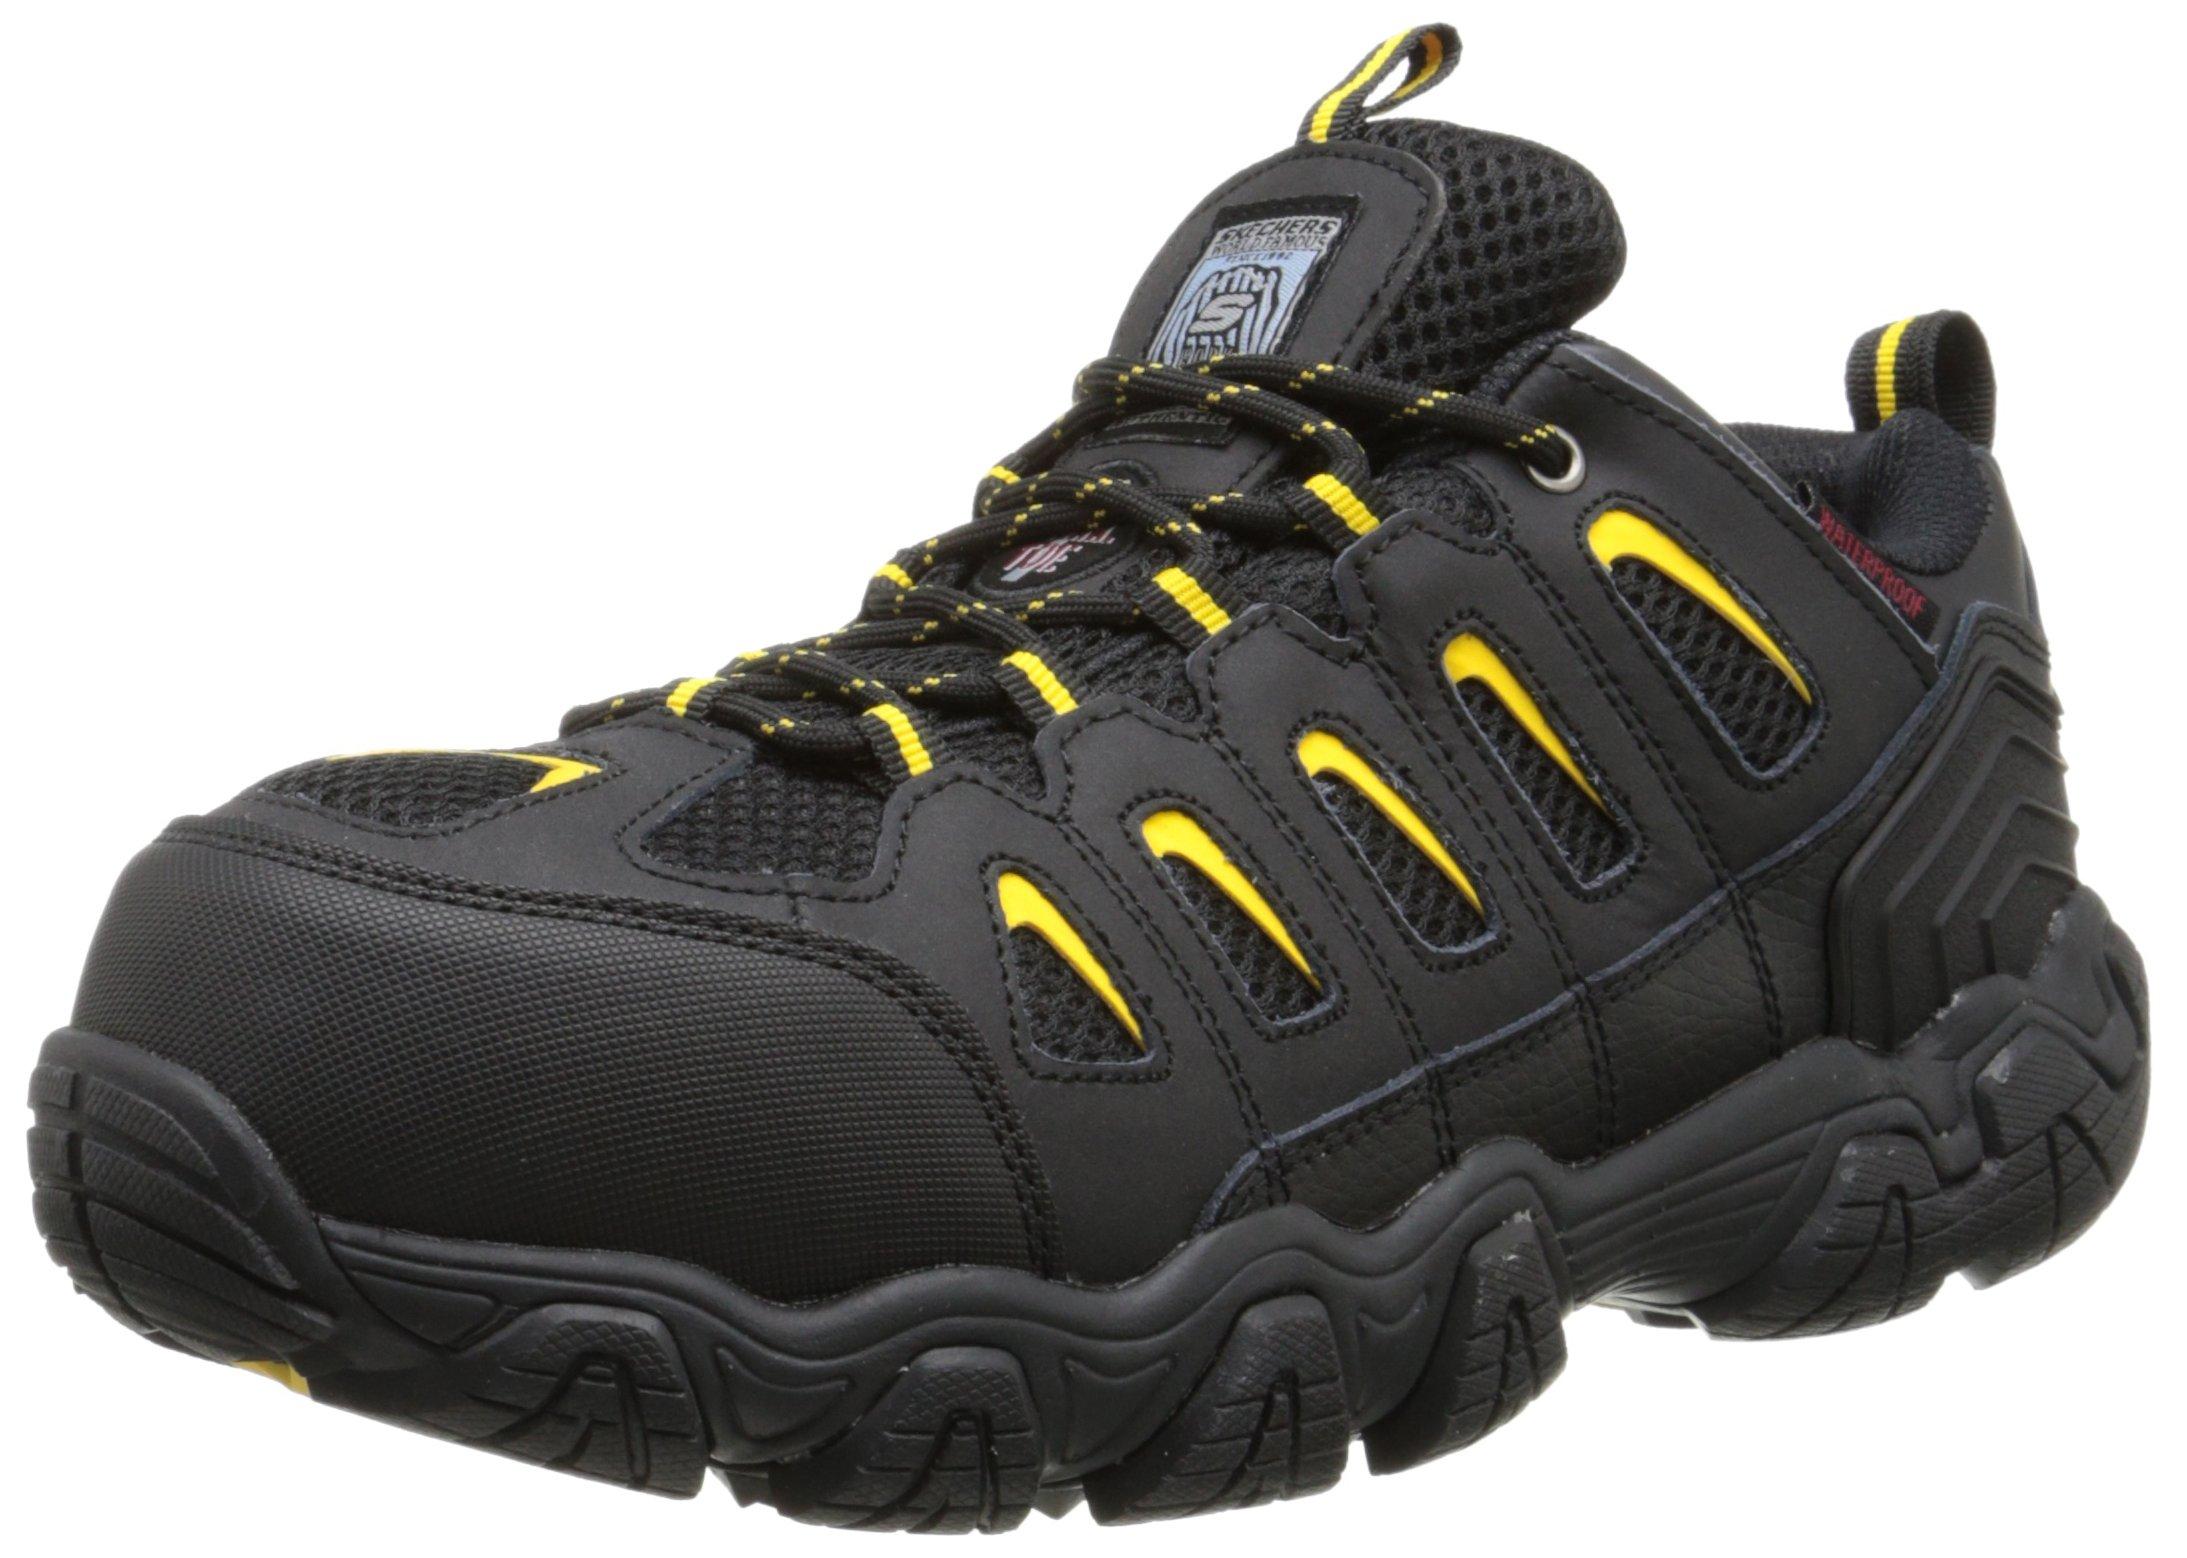 Skechers for Work Men's Blais Hiking Shoe, Black, 11 M US by Skechers